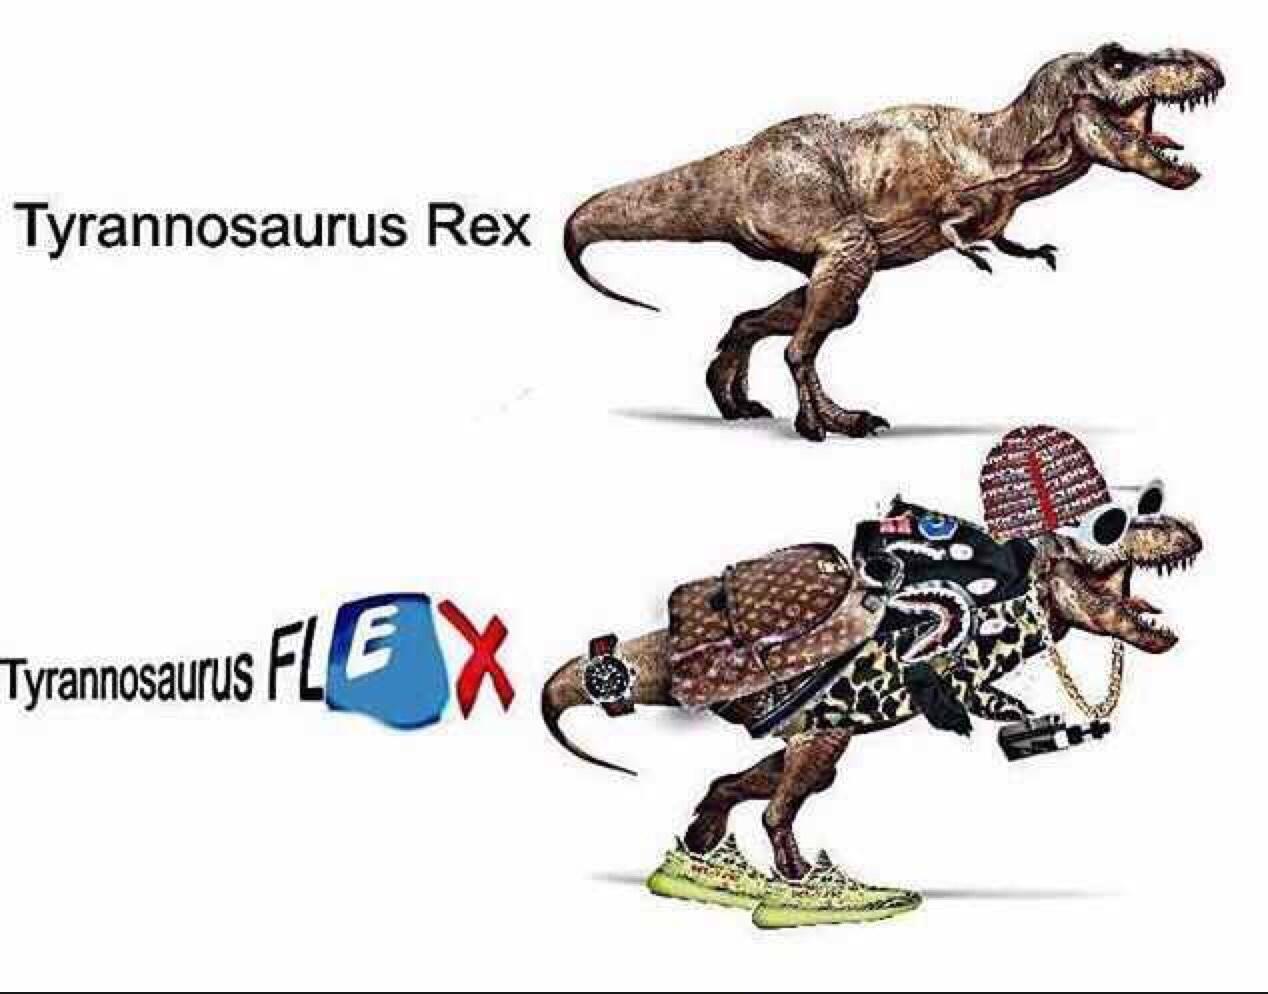 rice gums favourite dinosaur - meme